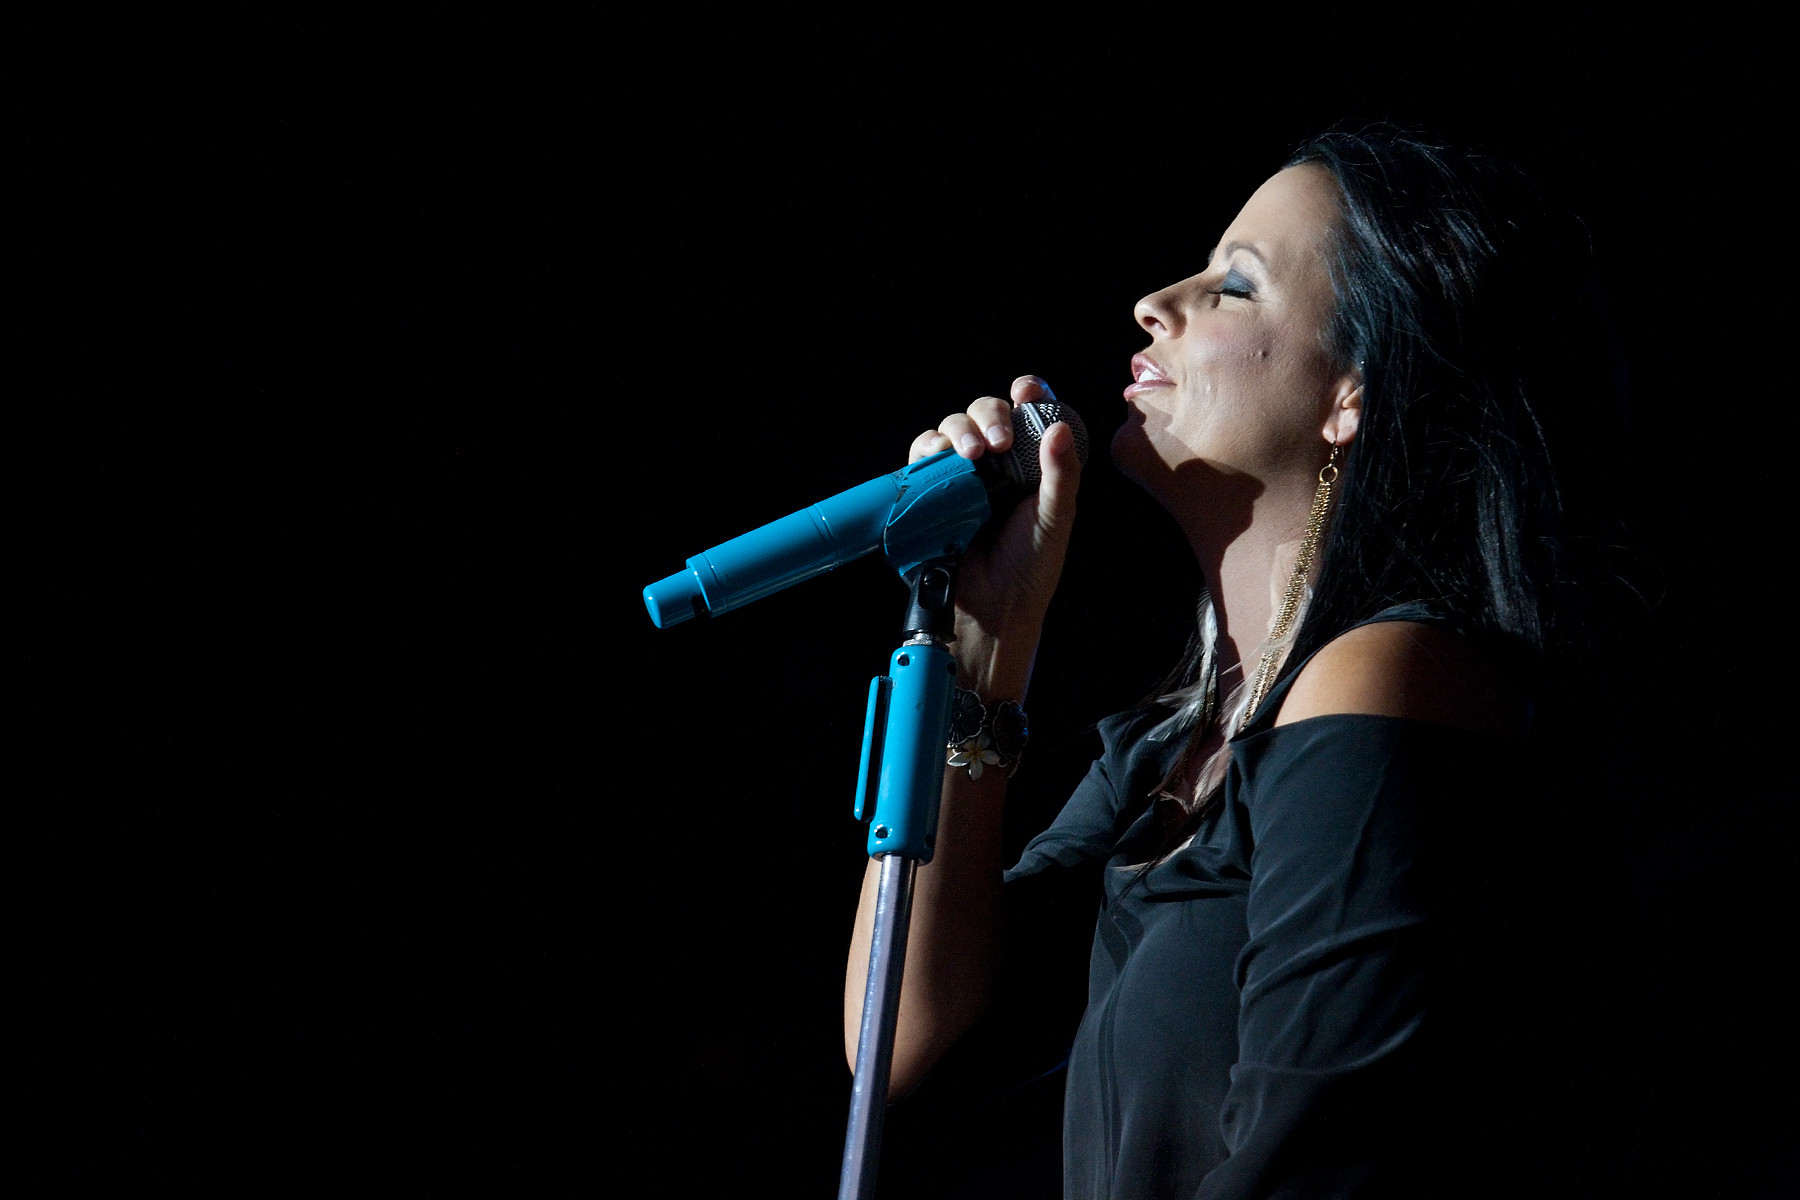 Sara Evans @ CMT Music Festival 2011